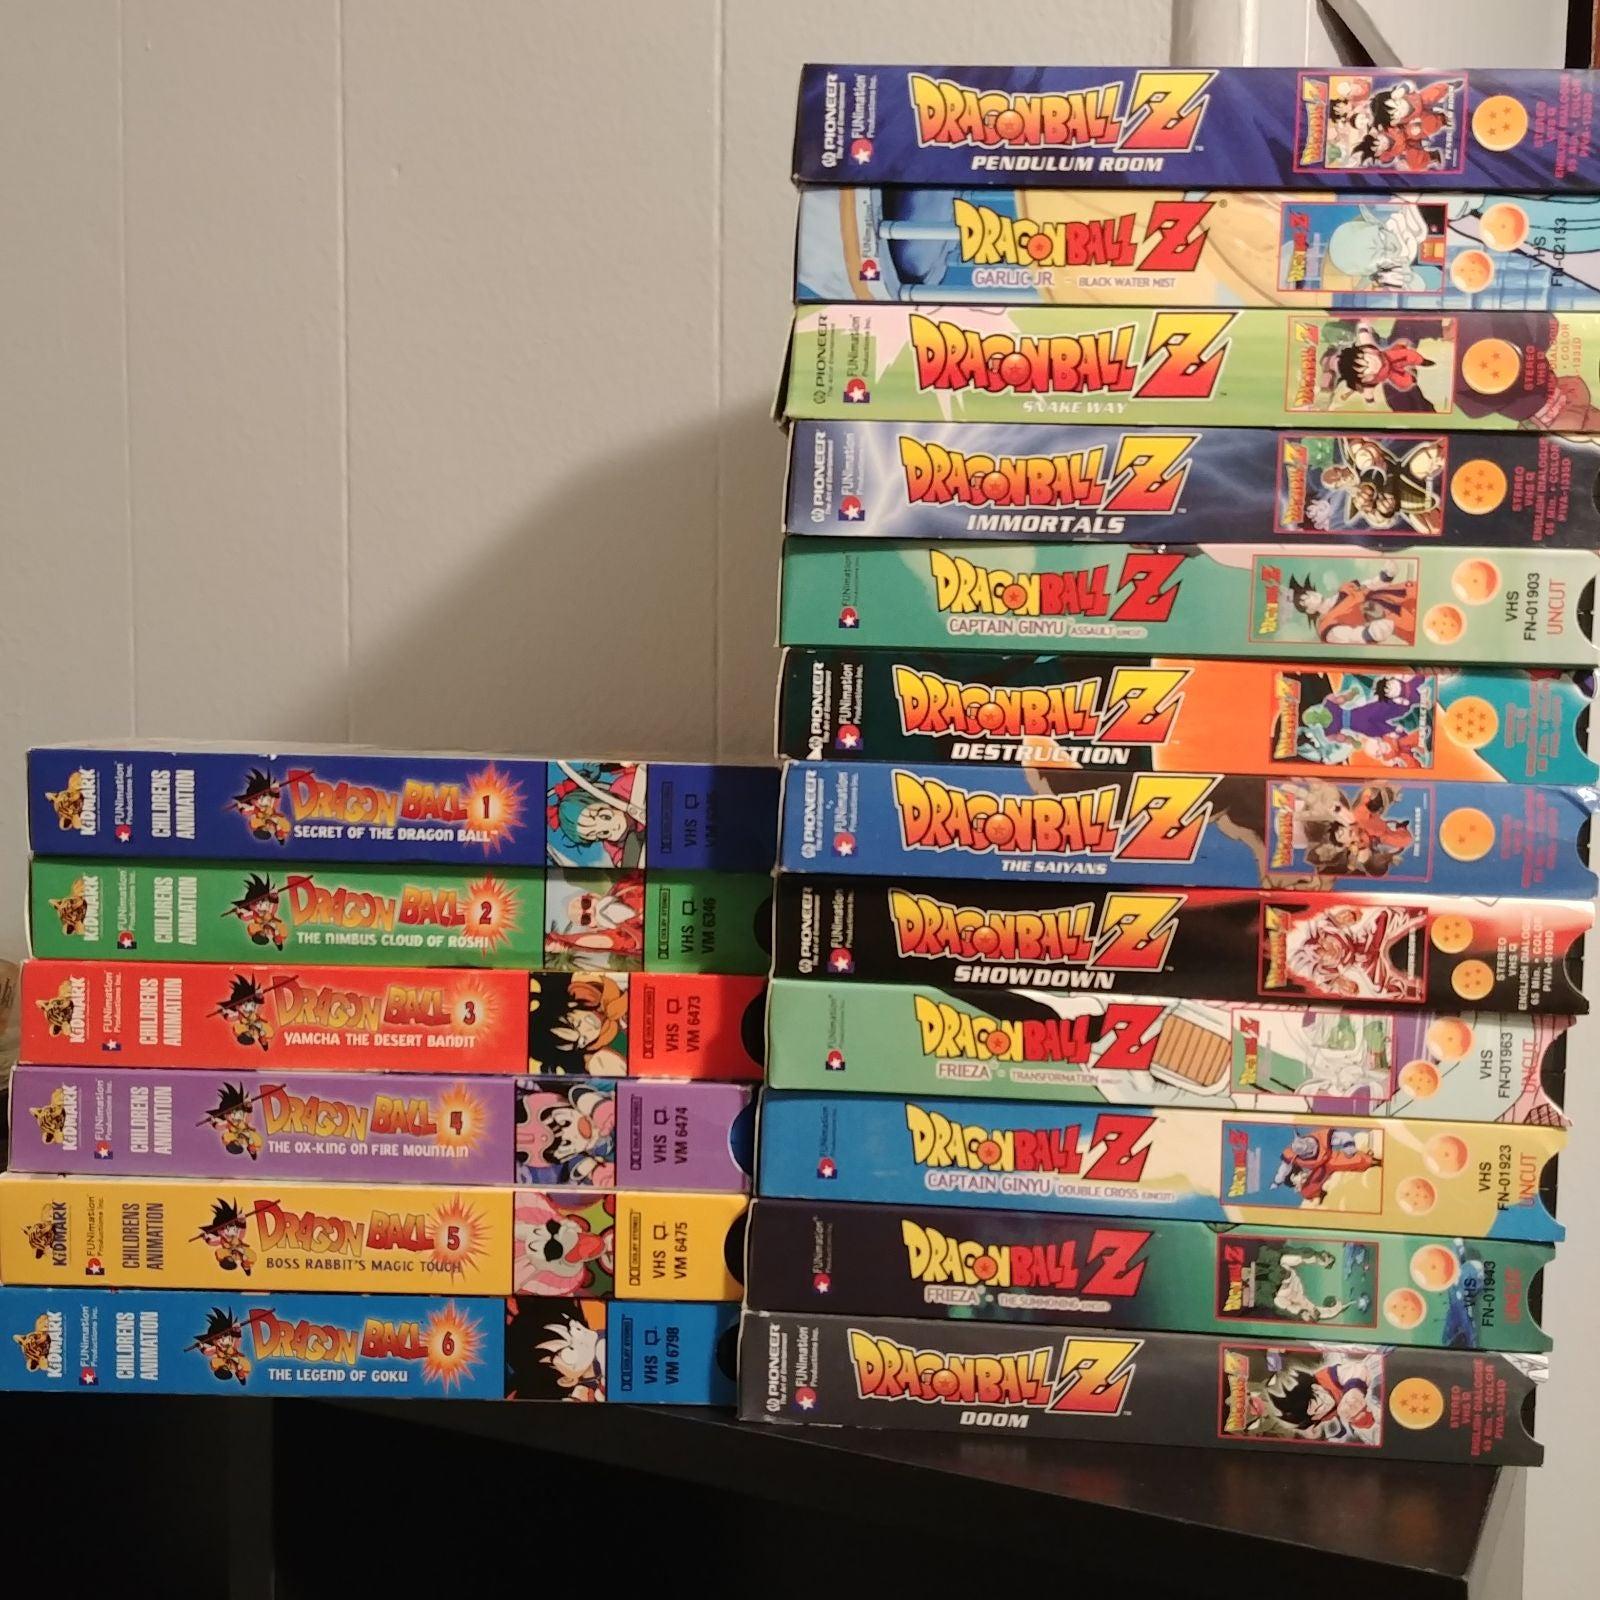 Lot of 18 Dragonball Z VHS